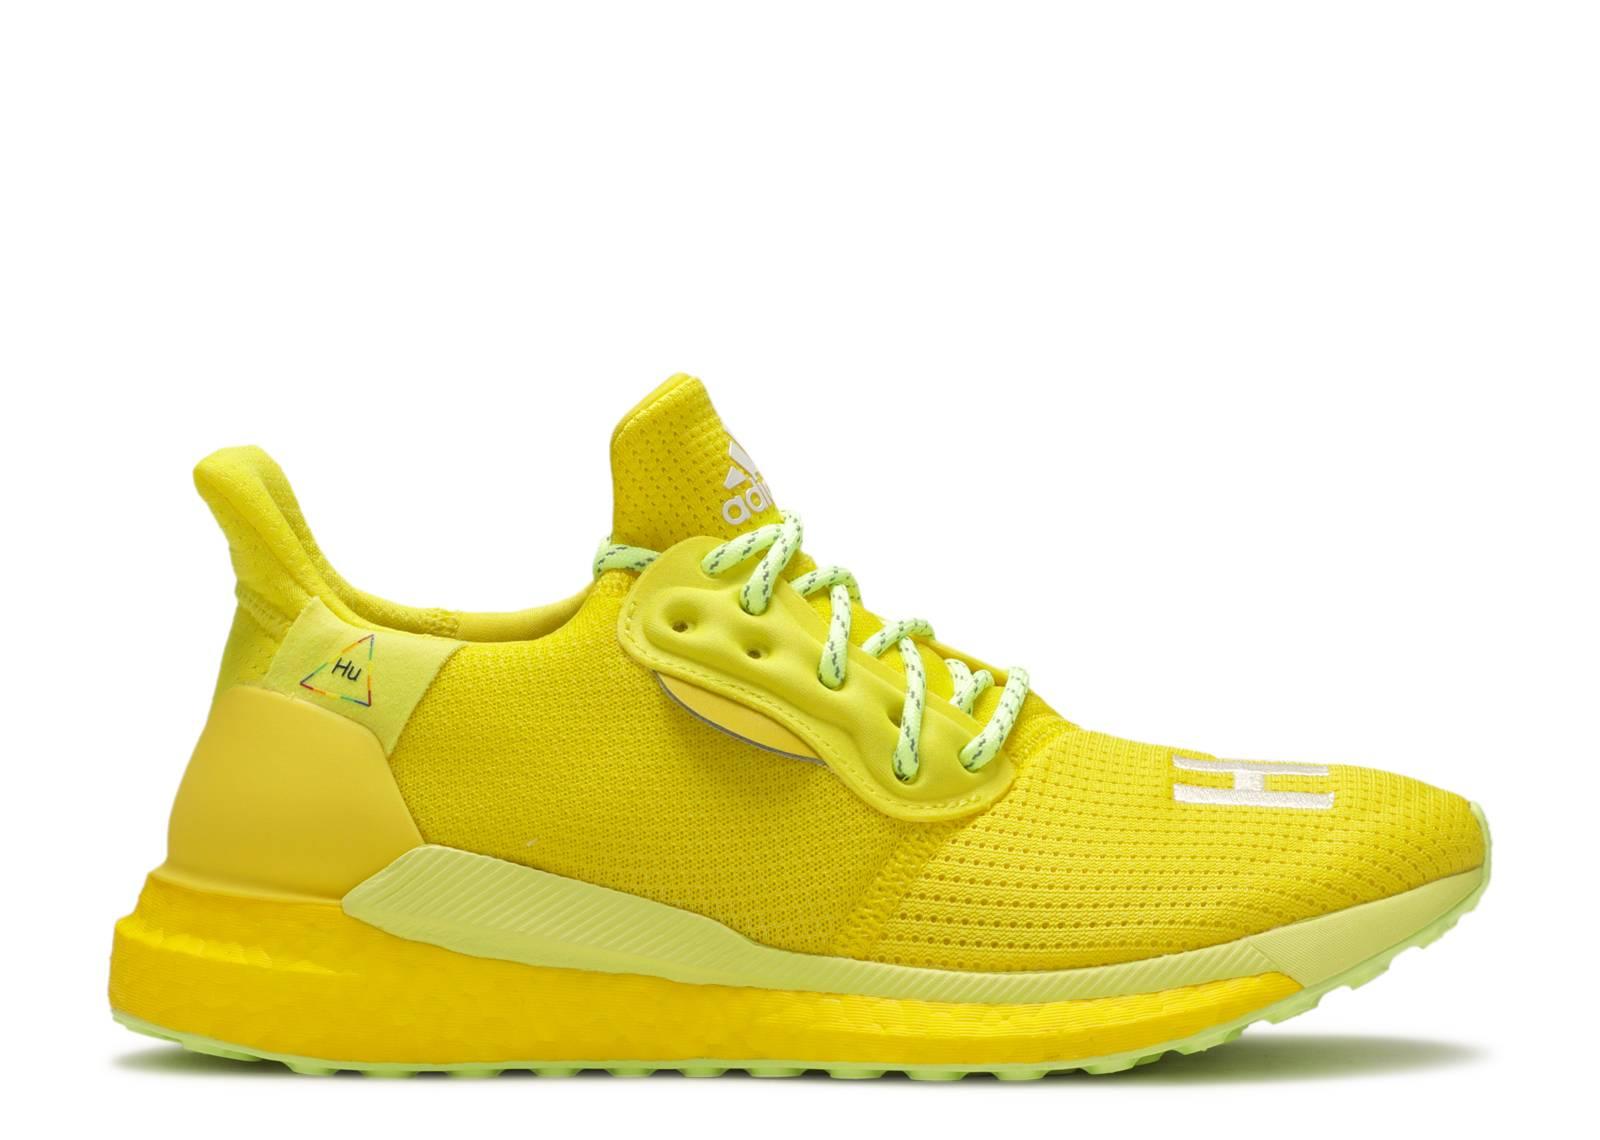 NEU! Gr. 47 Adidas x Pharrell Williams Solar Hu Glide Schuhe